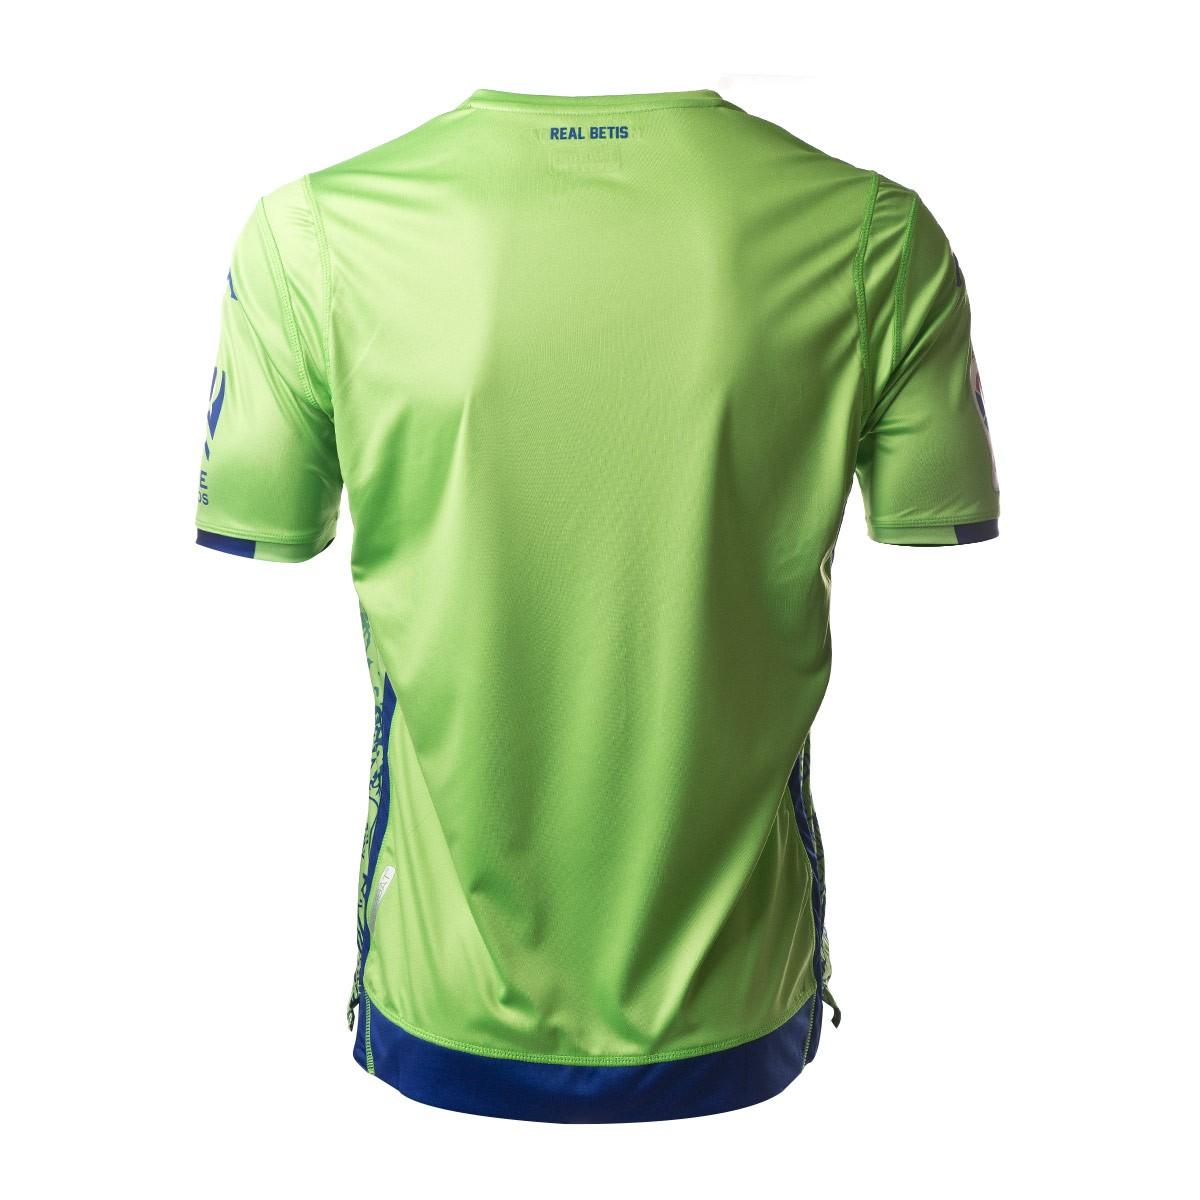 32612e4f1154b Camiseta Kappa Real Betis Balompié Tercera Equipación 2018-2019 Green flash  fantasy - Tienda de fútbol Fútbol Emotion